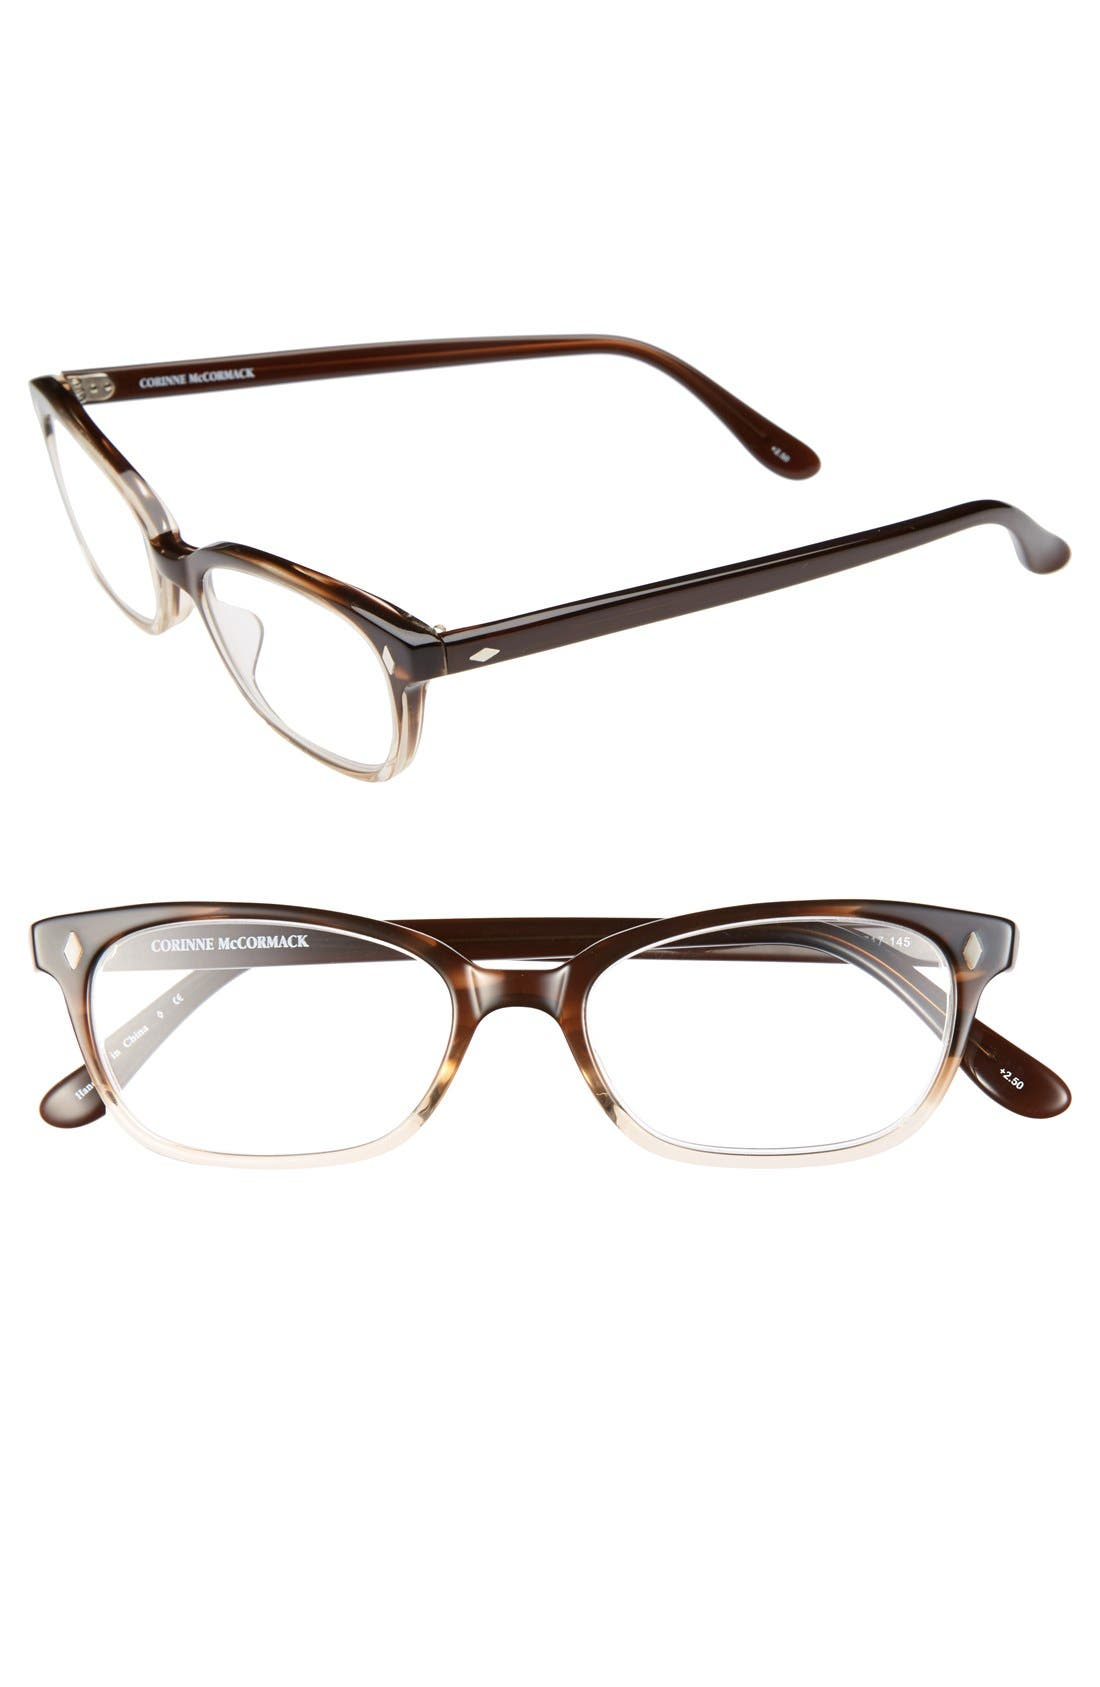 Main Image - Corinne McCormack 50mm Reading Glasses (2 for $88)